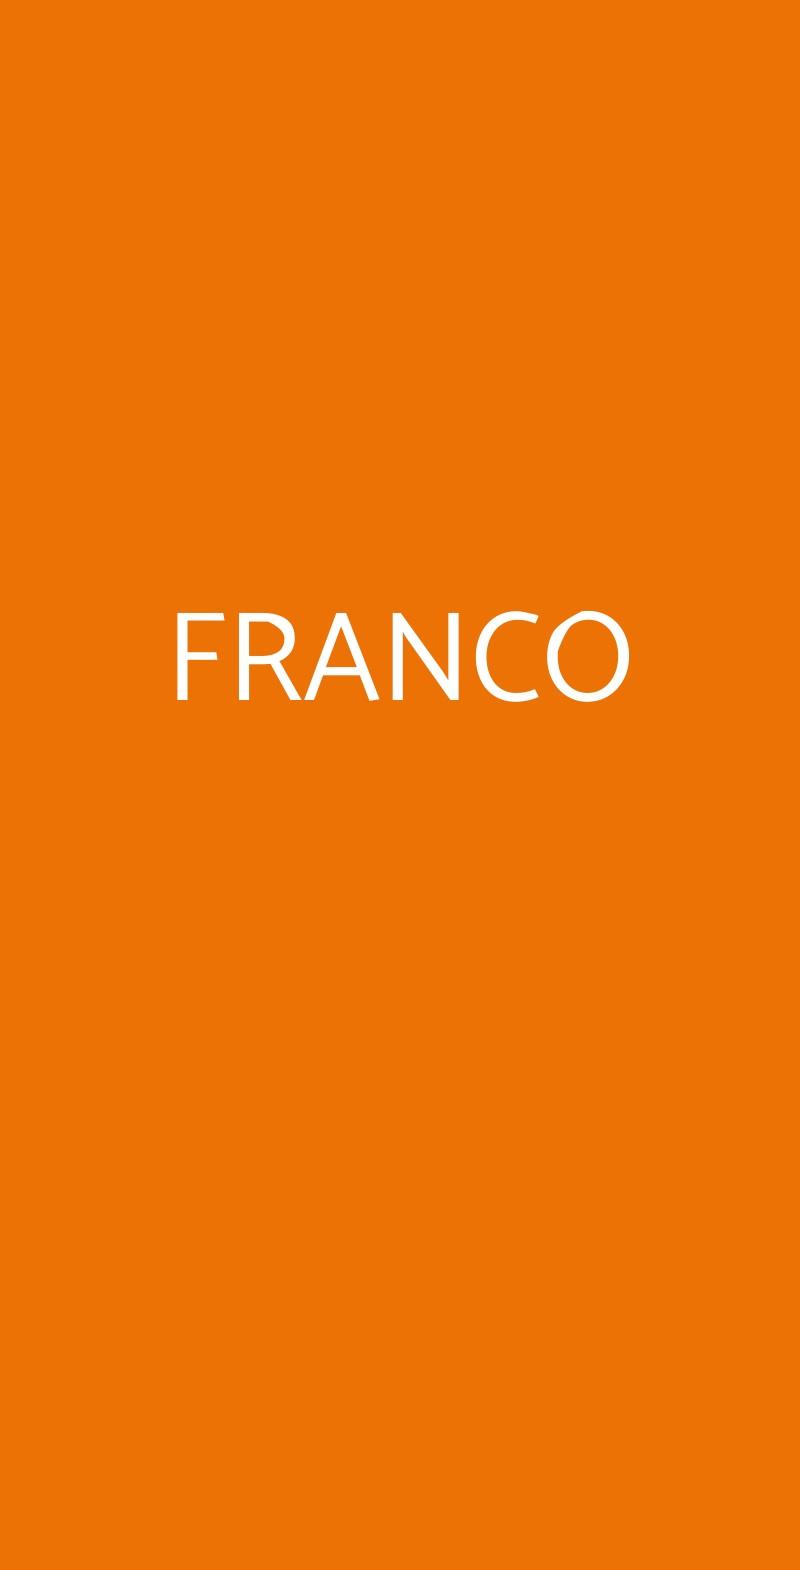 FRANCO Genova menù 1 pagina